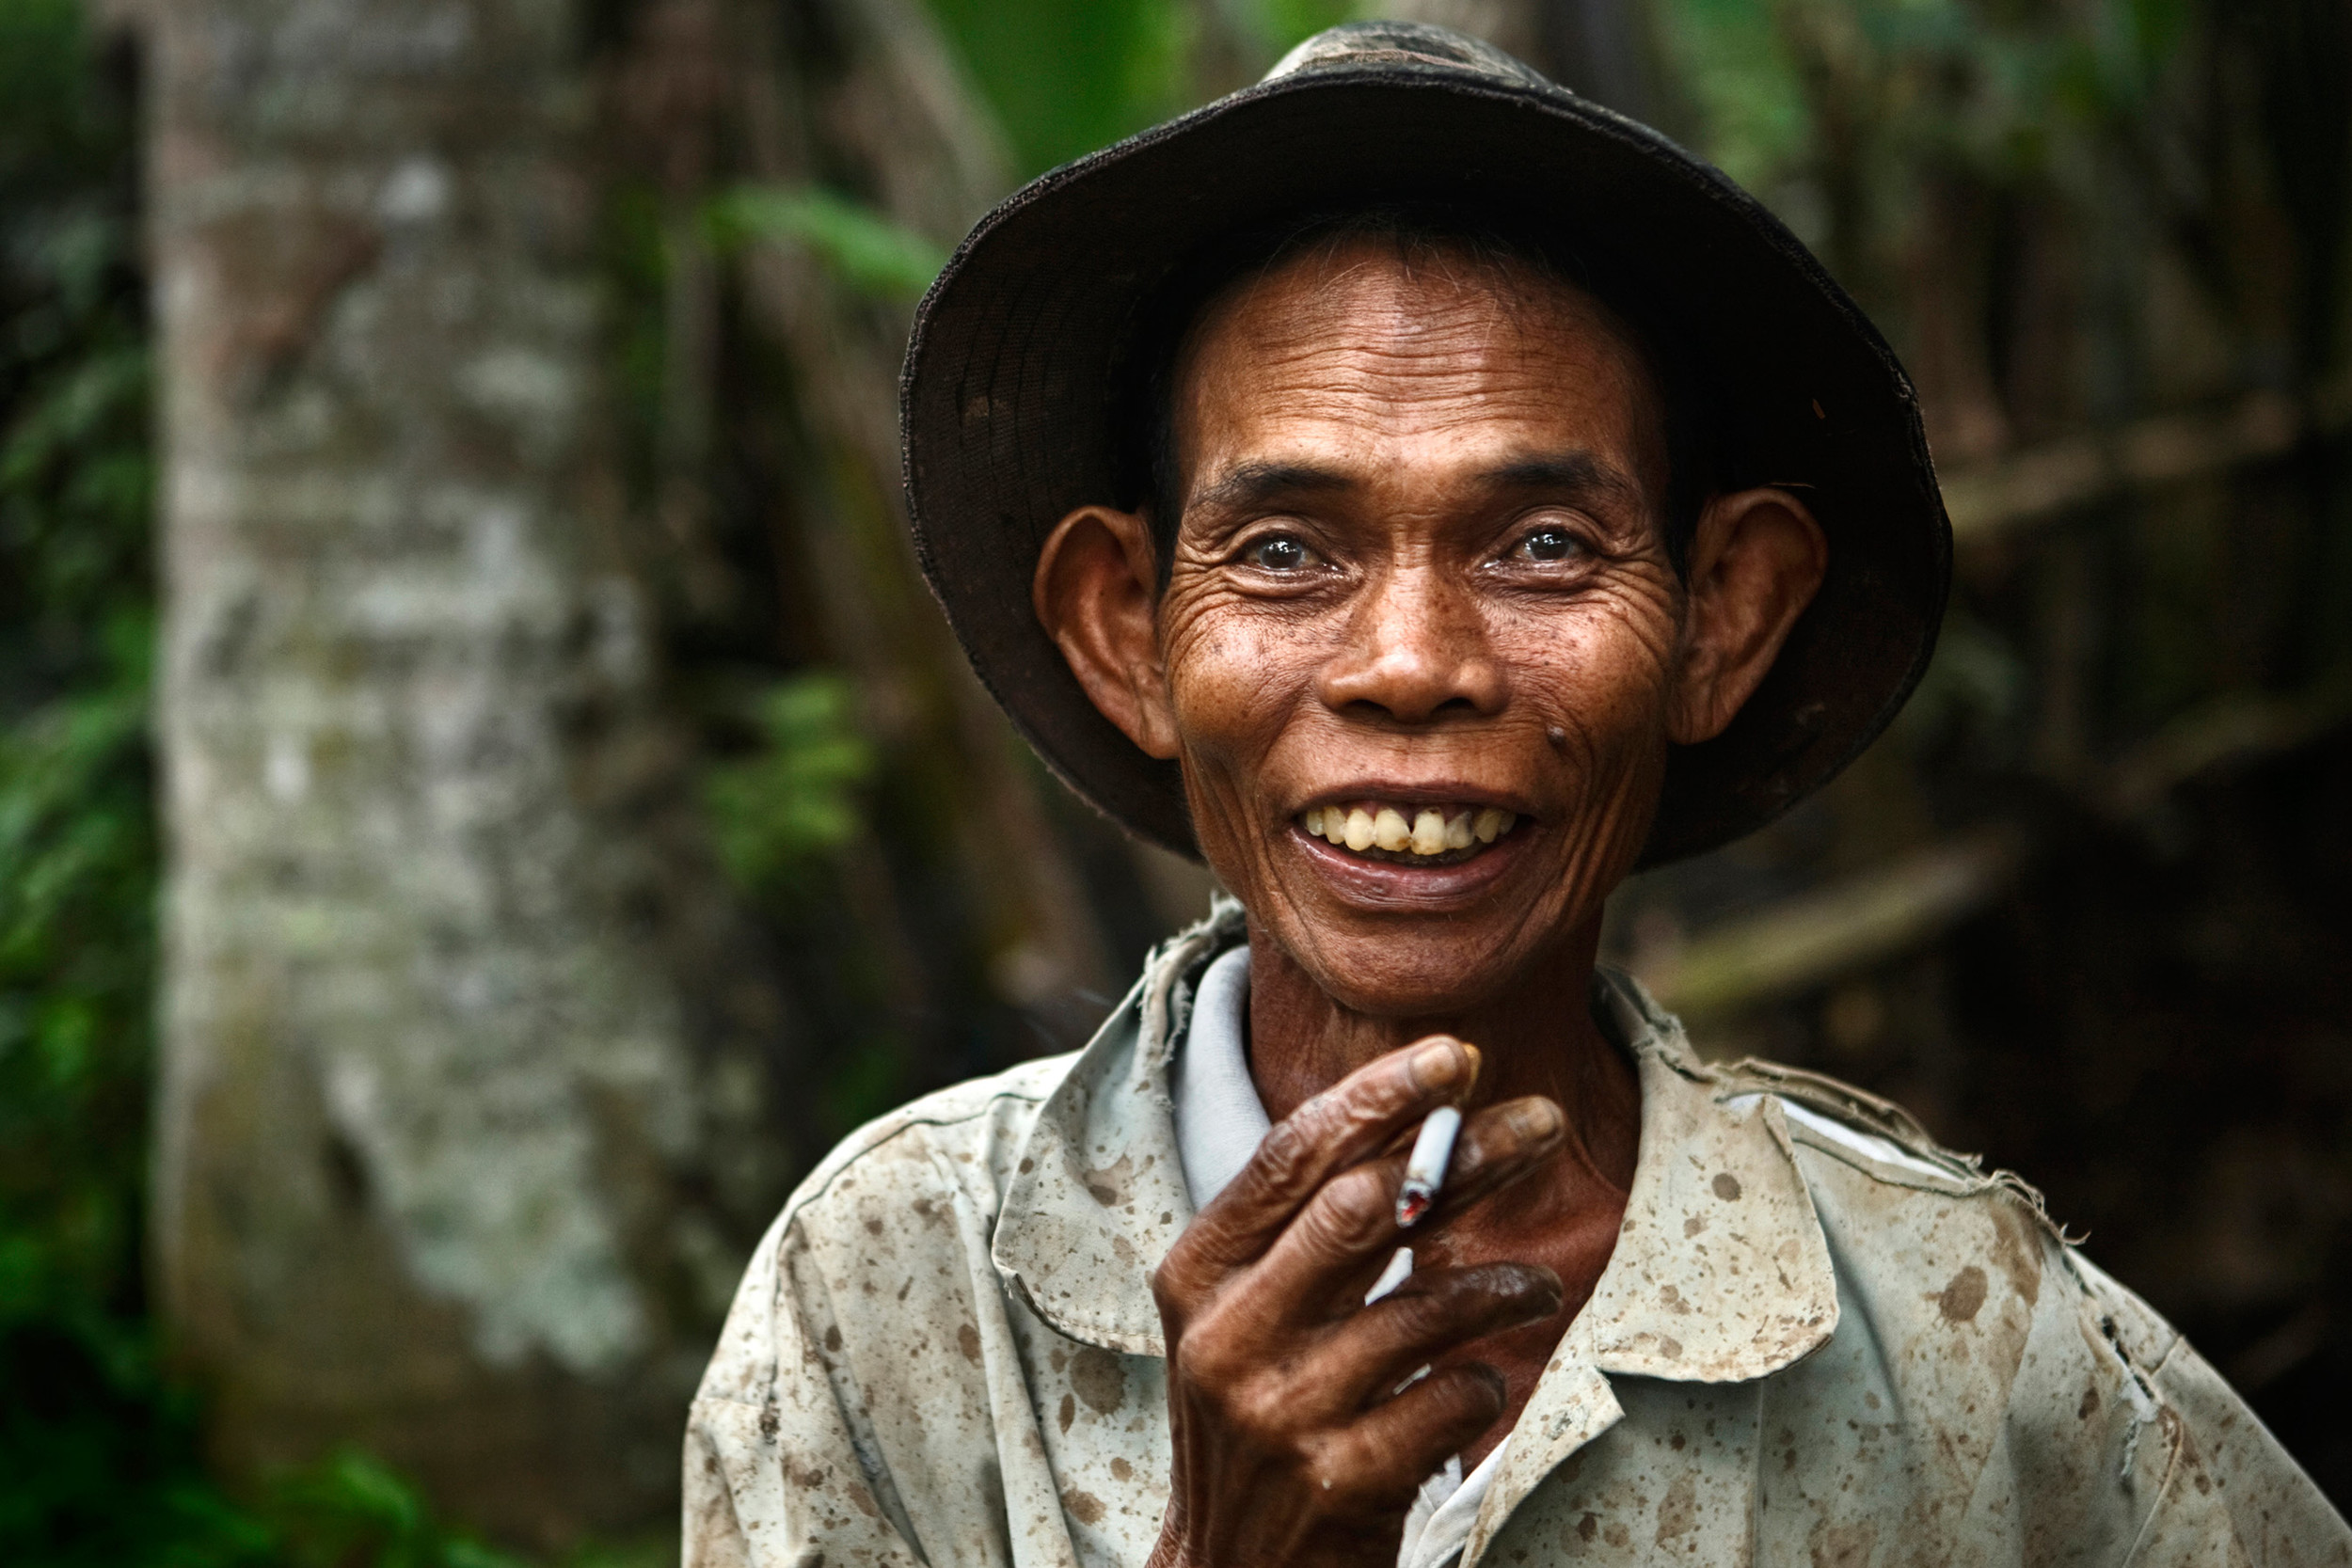 Javanese farmer smiling and smoking